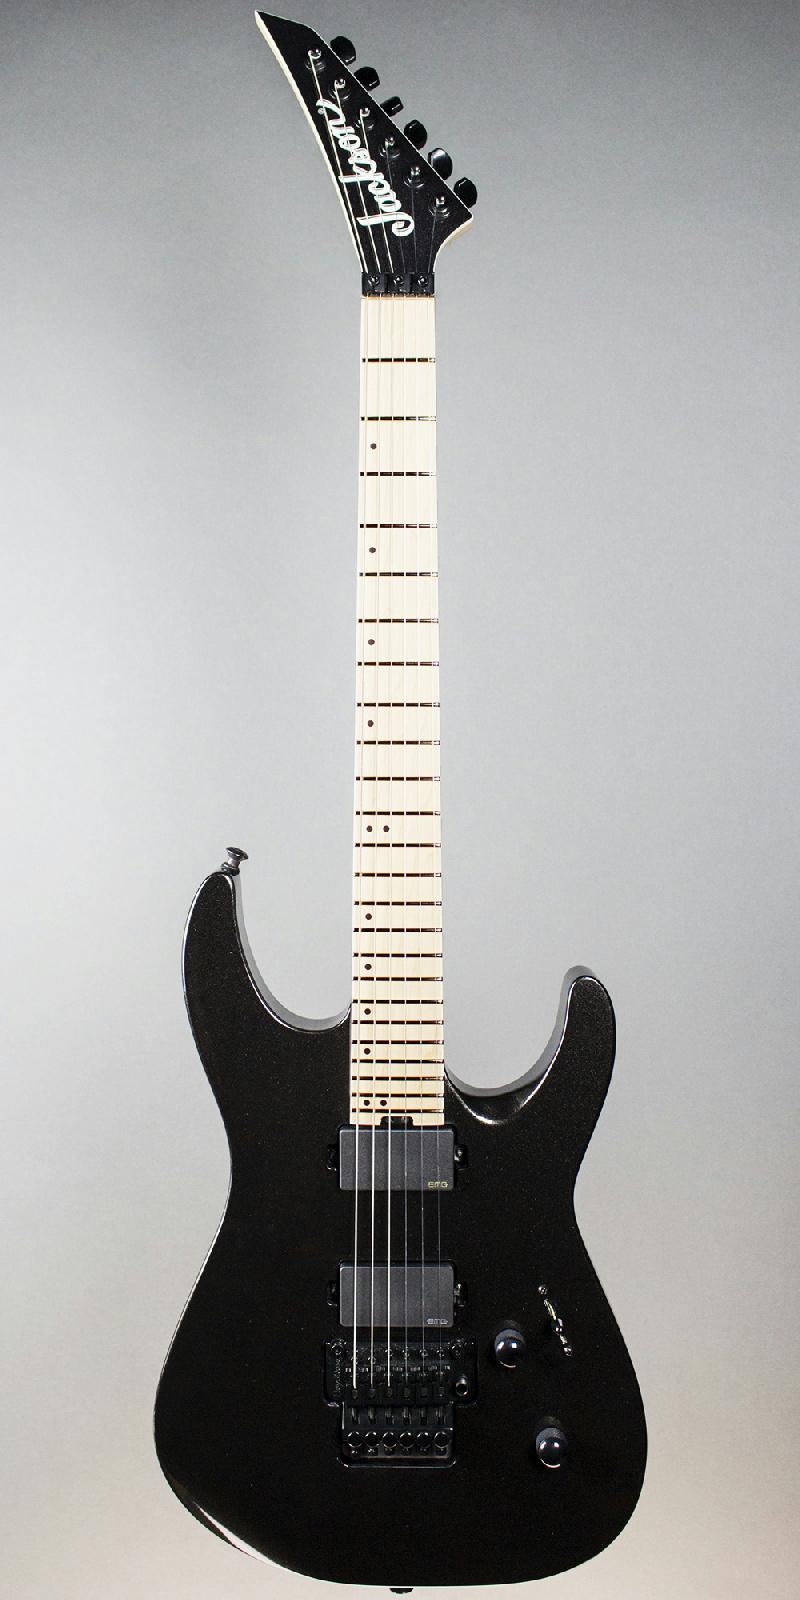 jackson pro series dinky dk2rmg m electric guitar metallic black finish. Black Bedroom Furniture Sets. Home Design Ideas